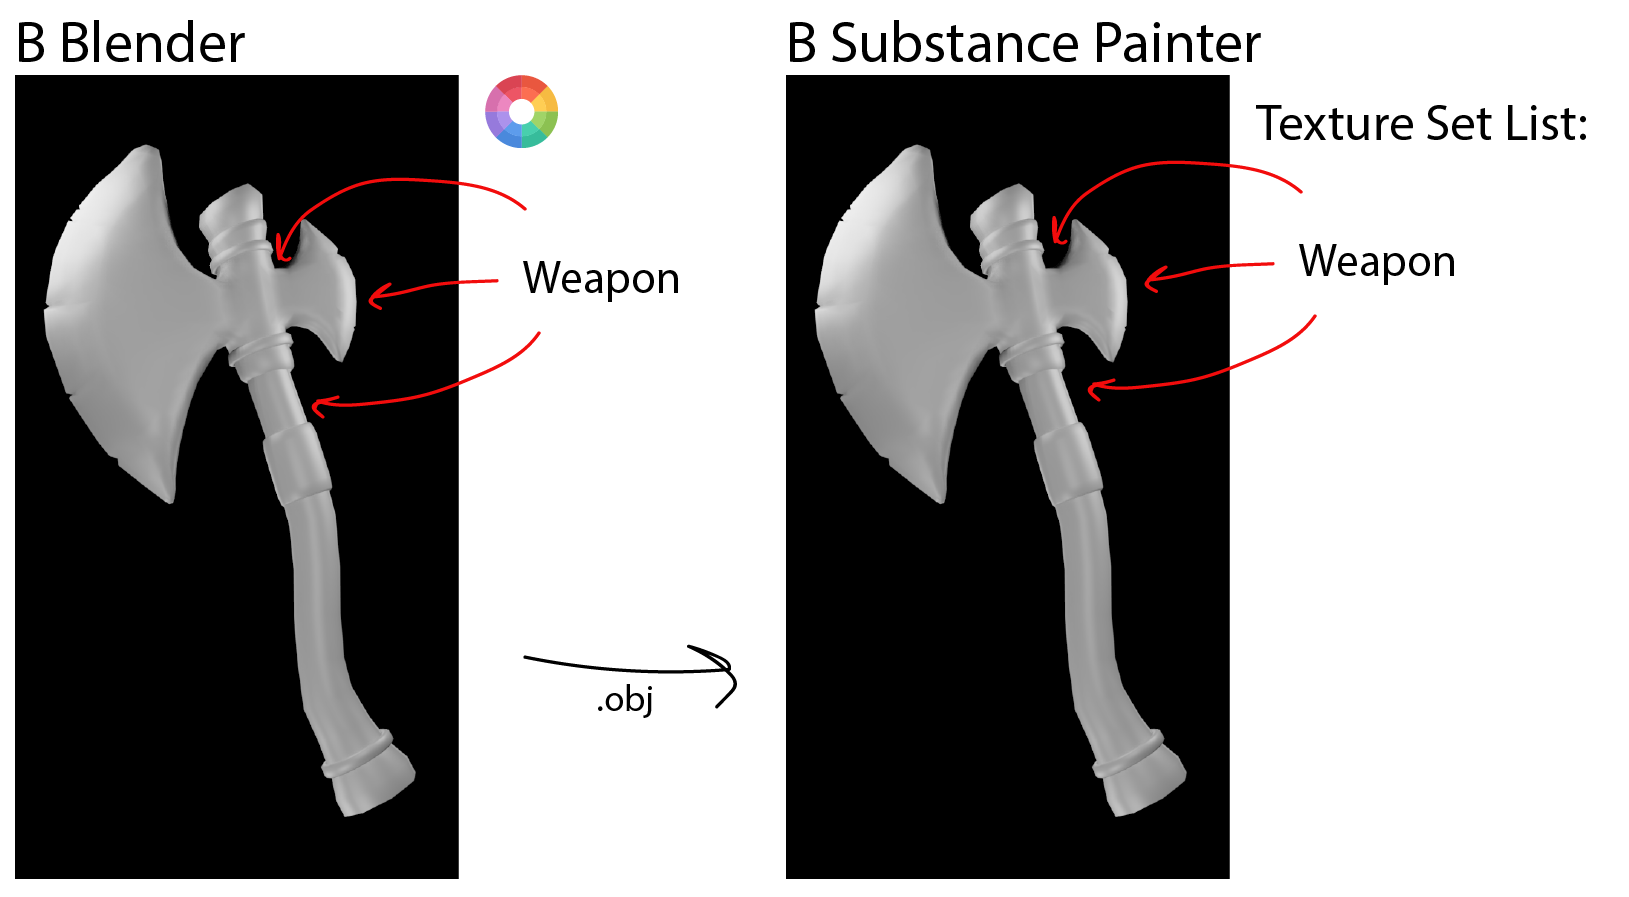 Merge texture sets, или как делать один набор текстур в Substance Painter - 3